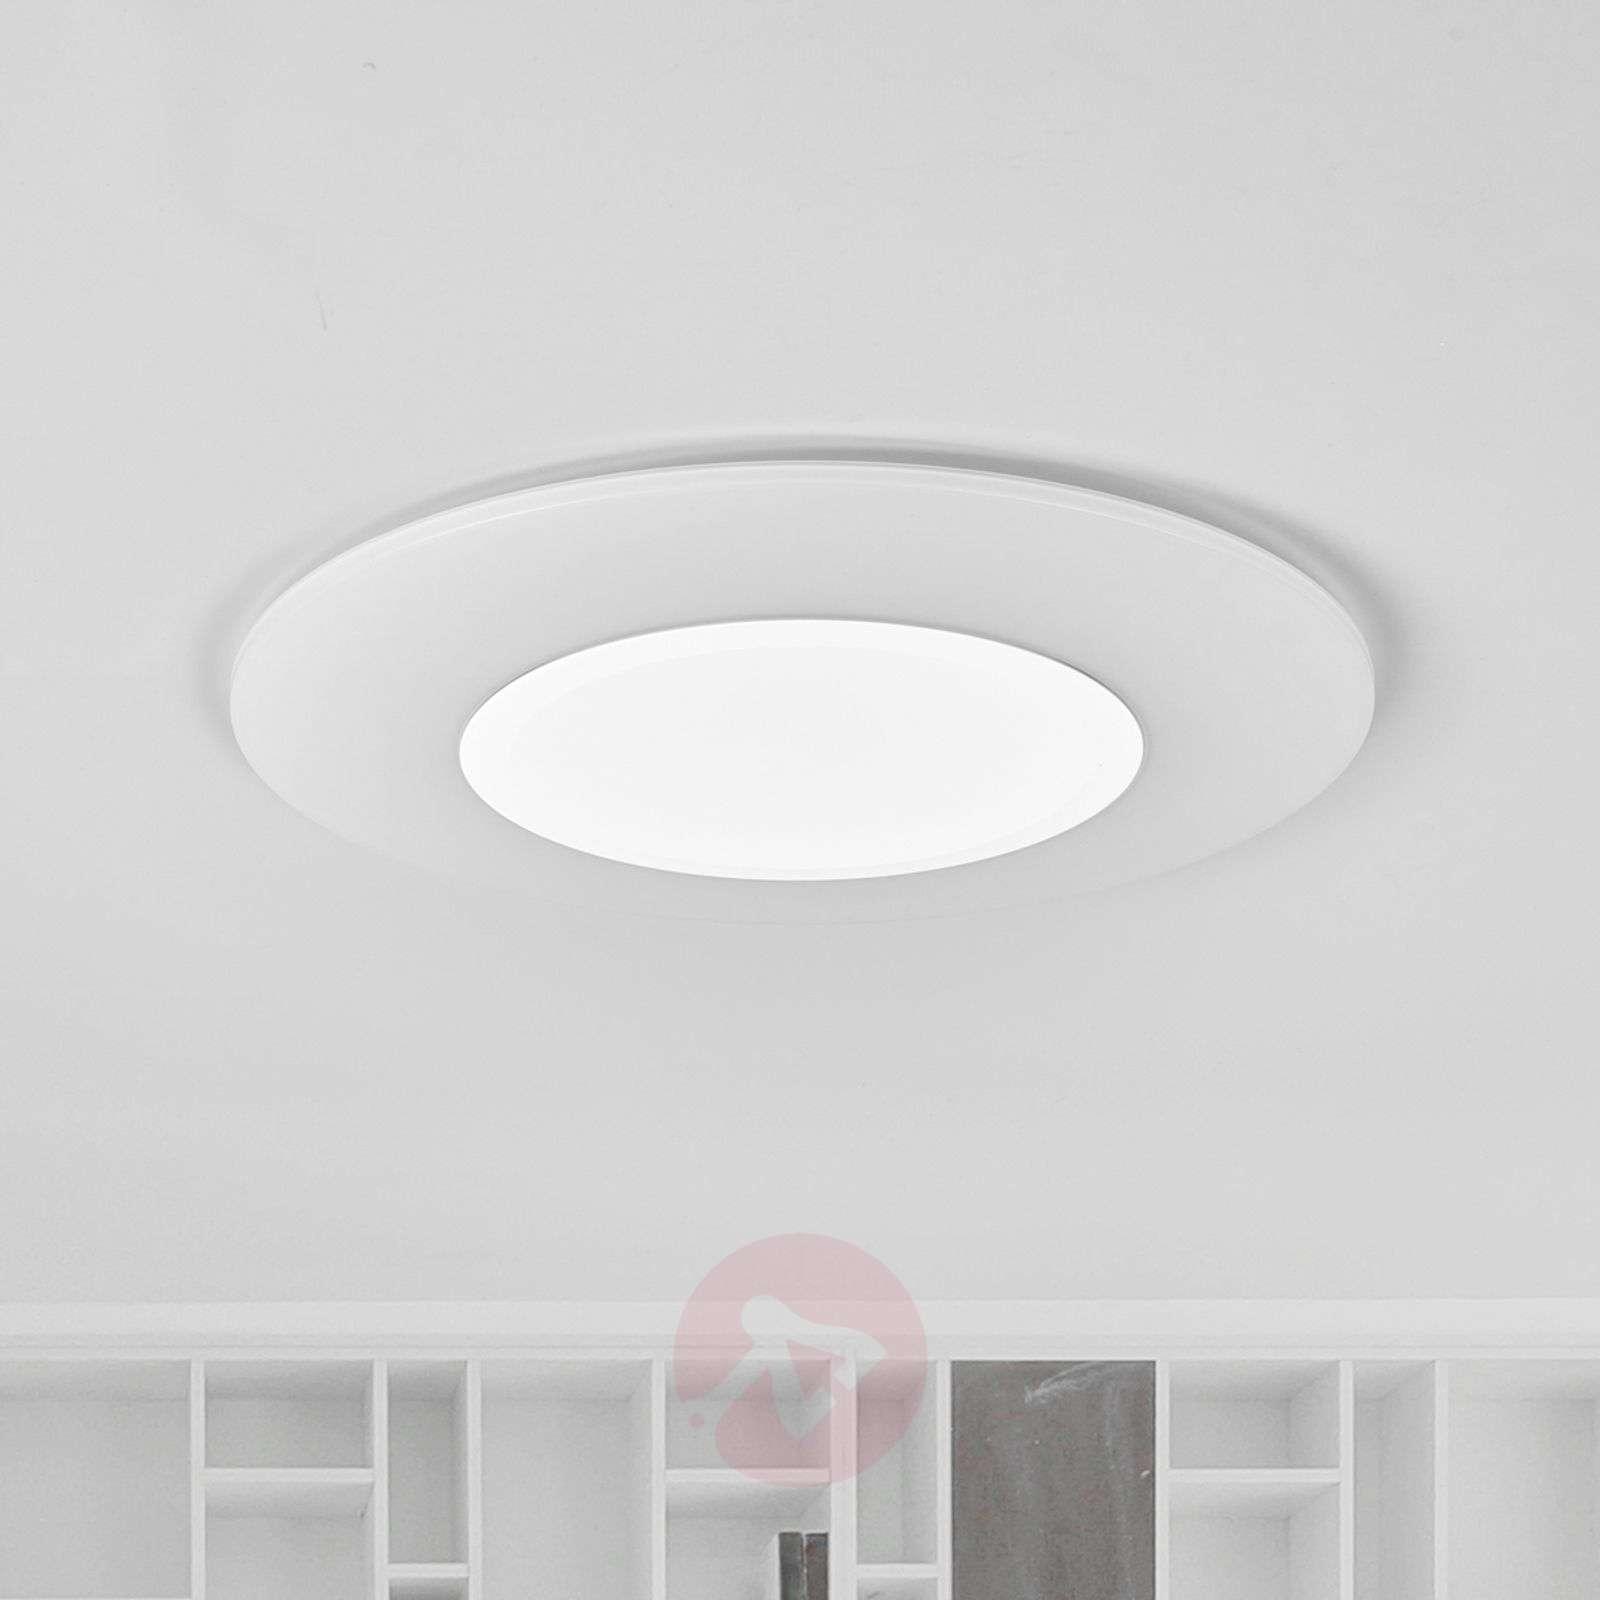 Very flat ceiling light LED Flat-1,200 lumens-7261139-01